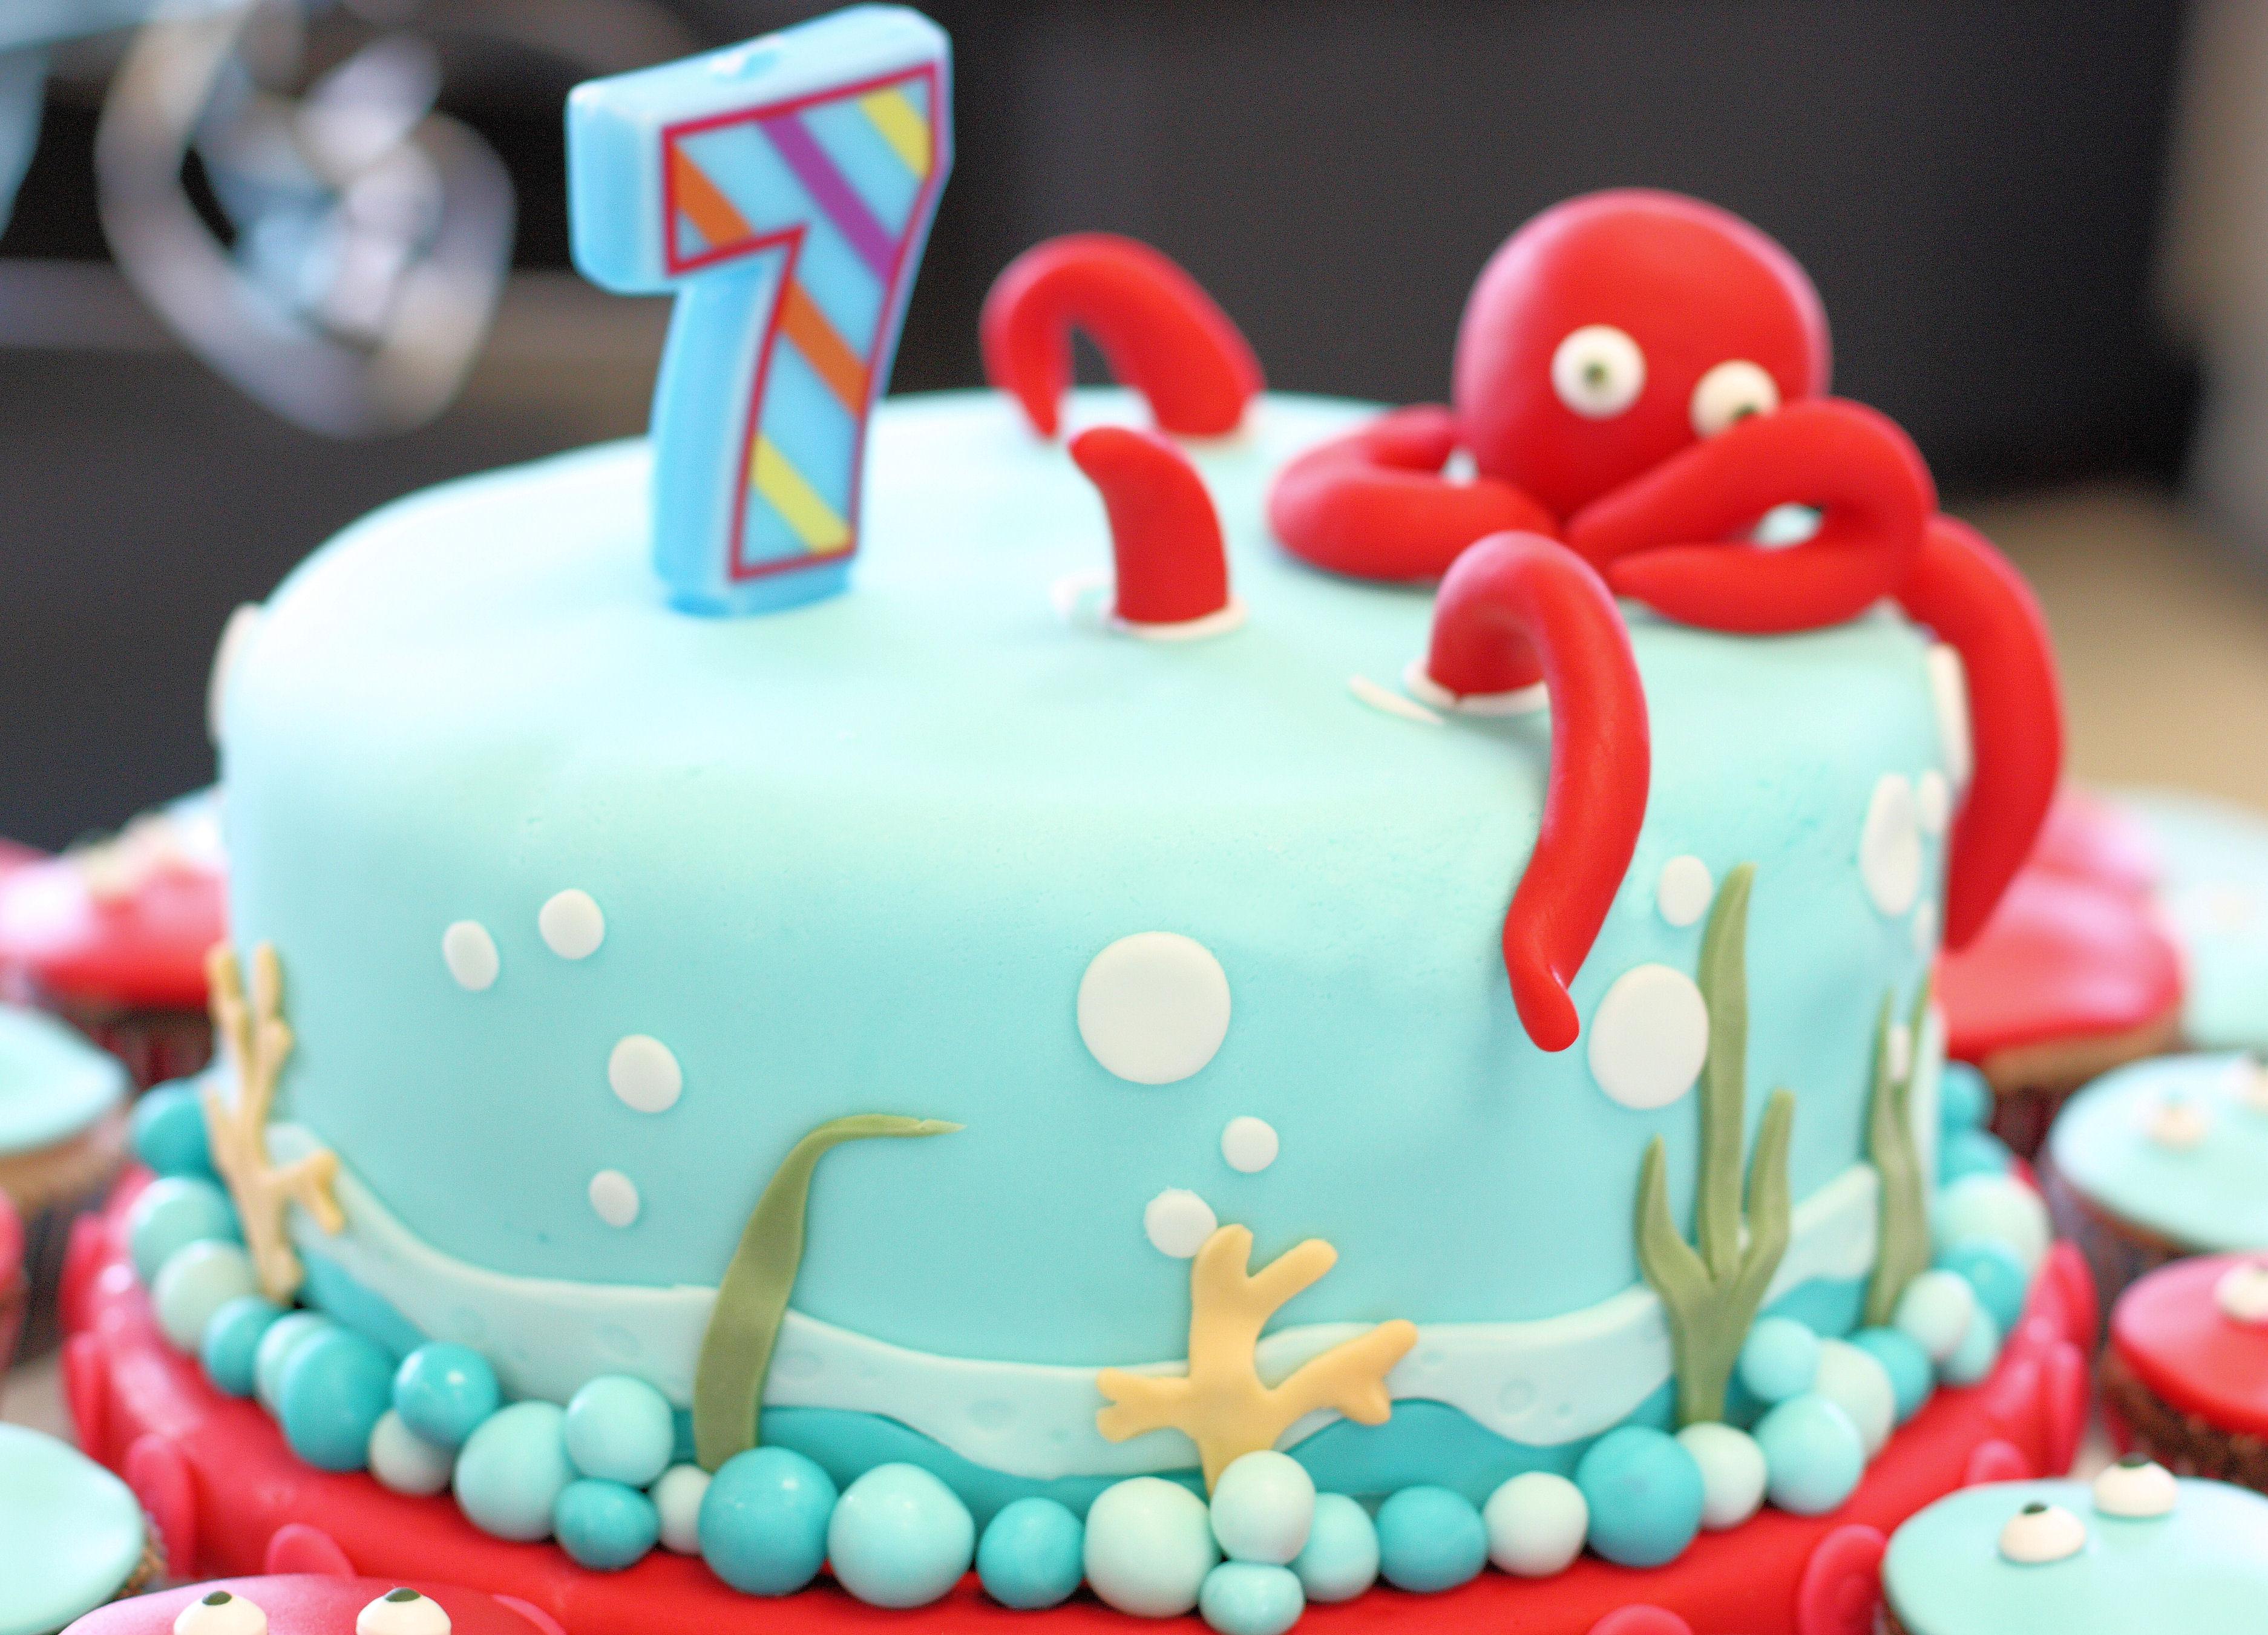 Groovy Octopus Birthday Cake Sugar Rainbow Cakes Funny Birthday Cards Online Inifodamsfinfo